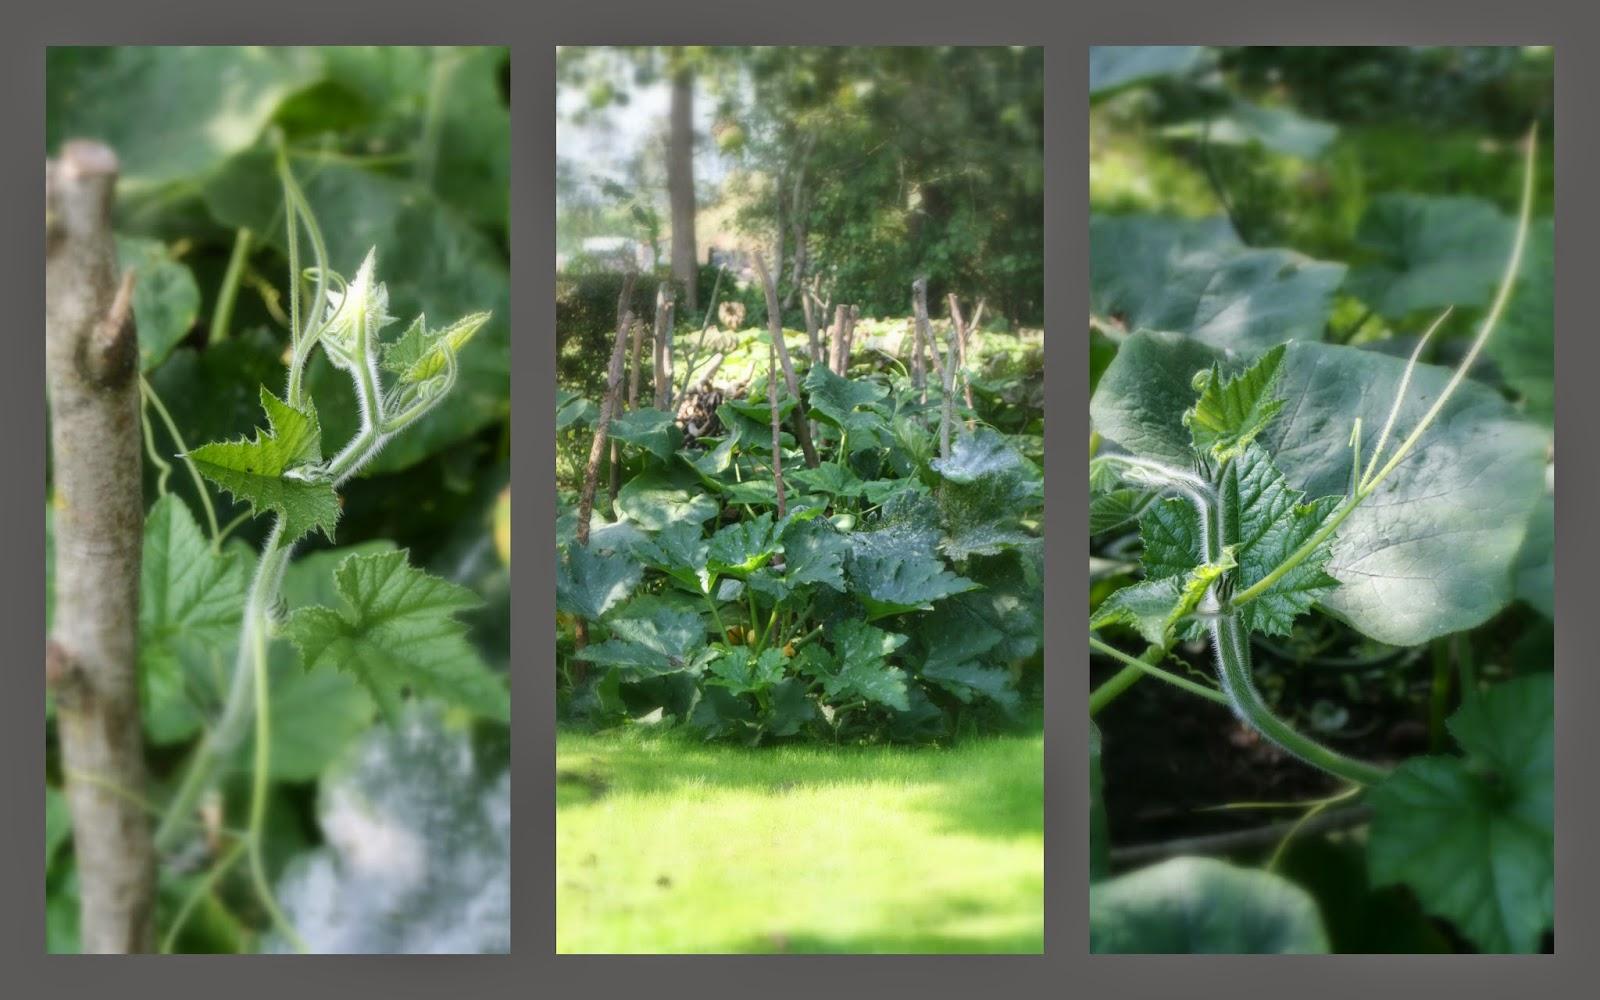 Greftenhus oan e ie: midsummer / herfst